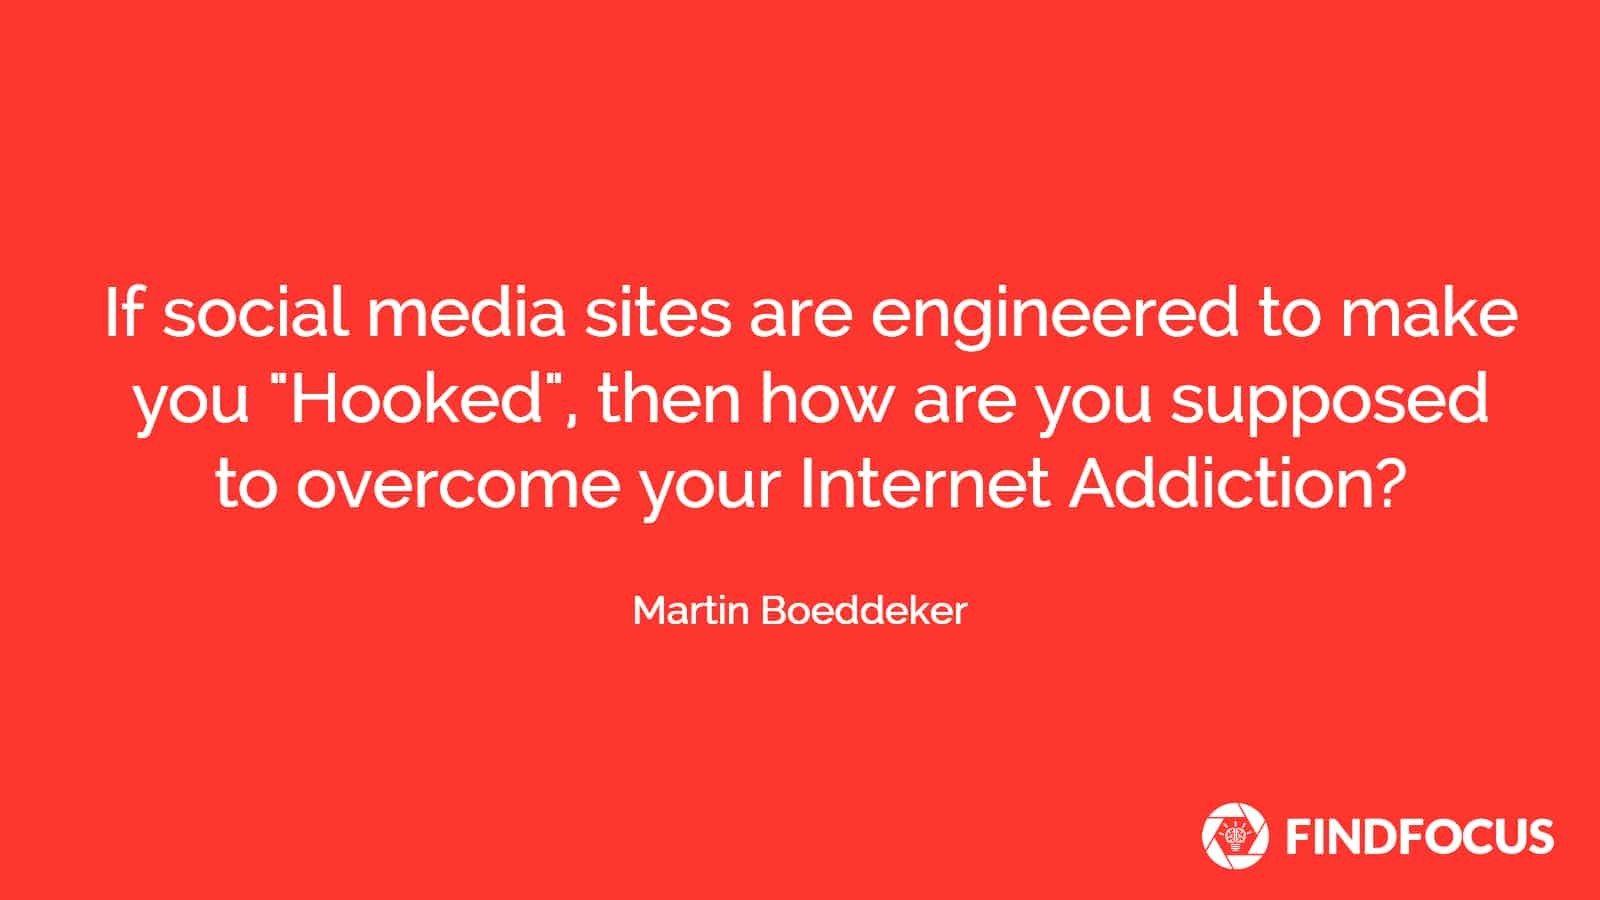 Social Media and Internet Addiction